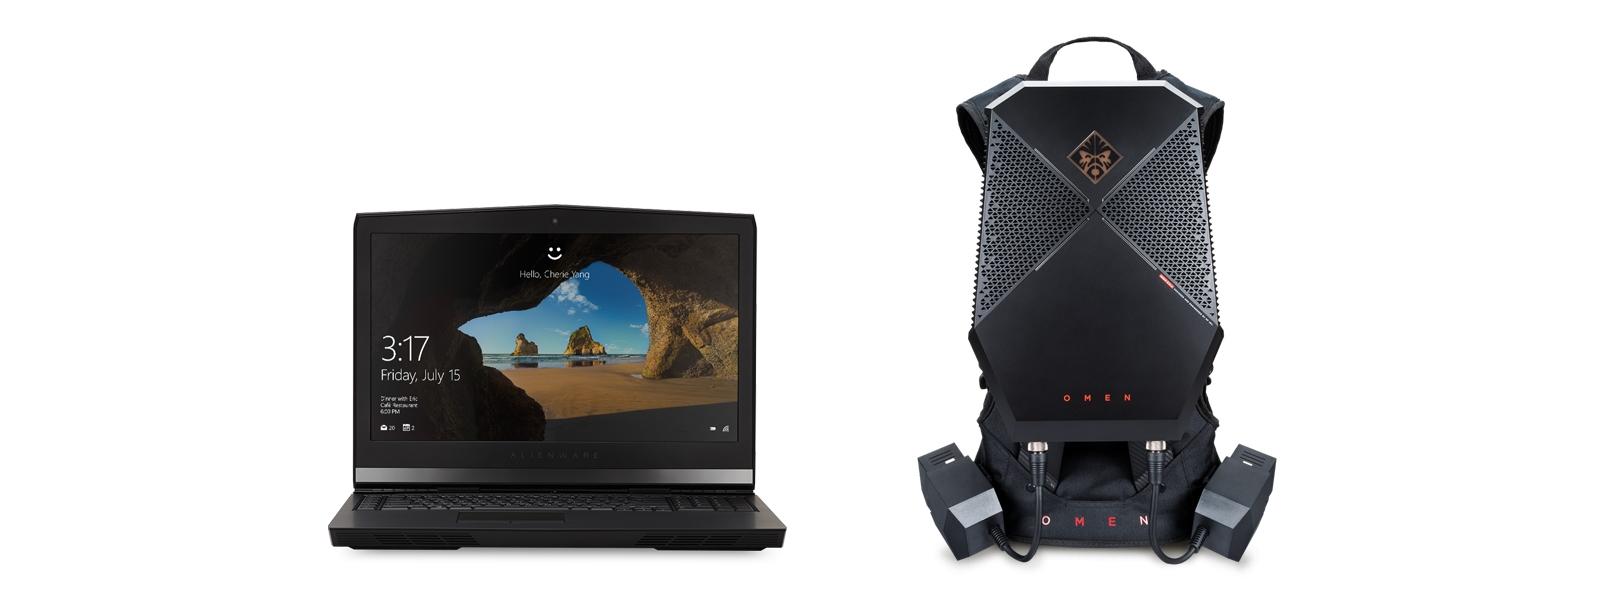 Dell Alienware 17 R4 的正面视图和 HP OMEN 的正面视图。